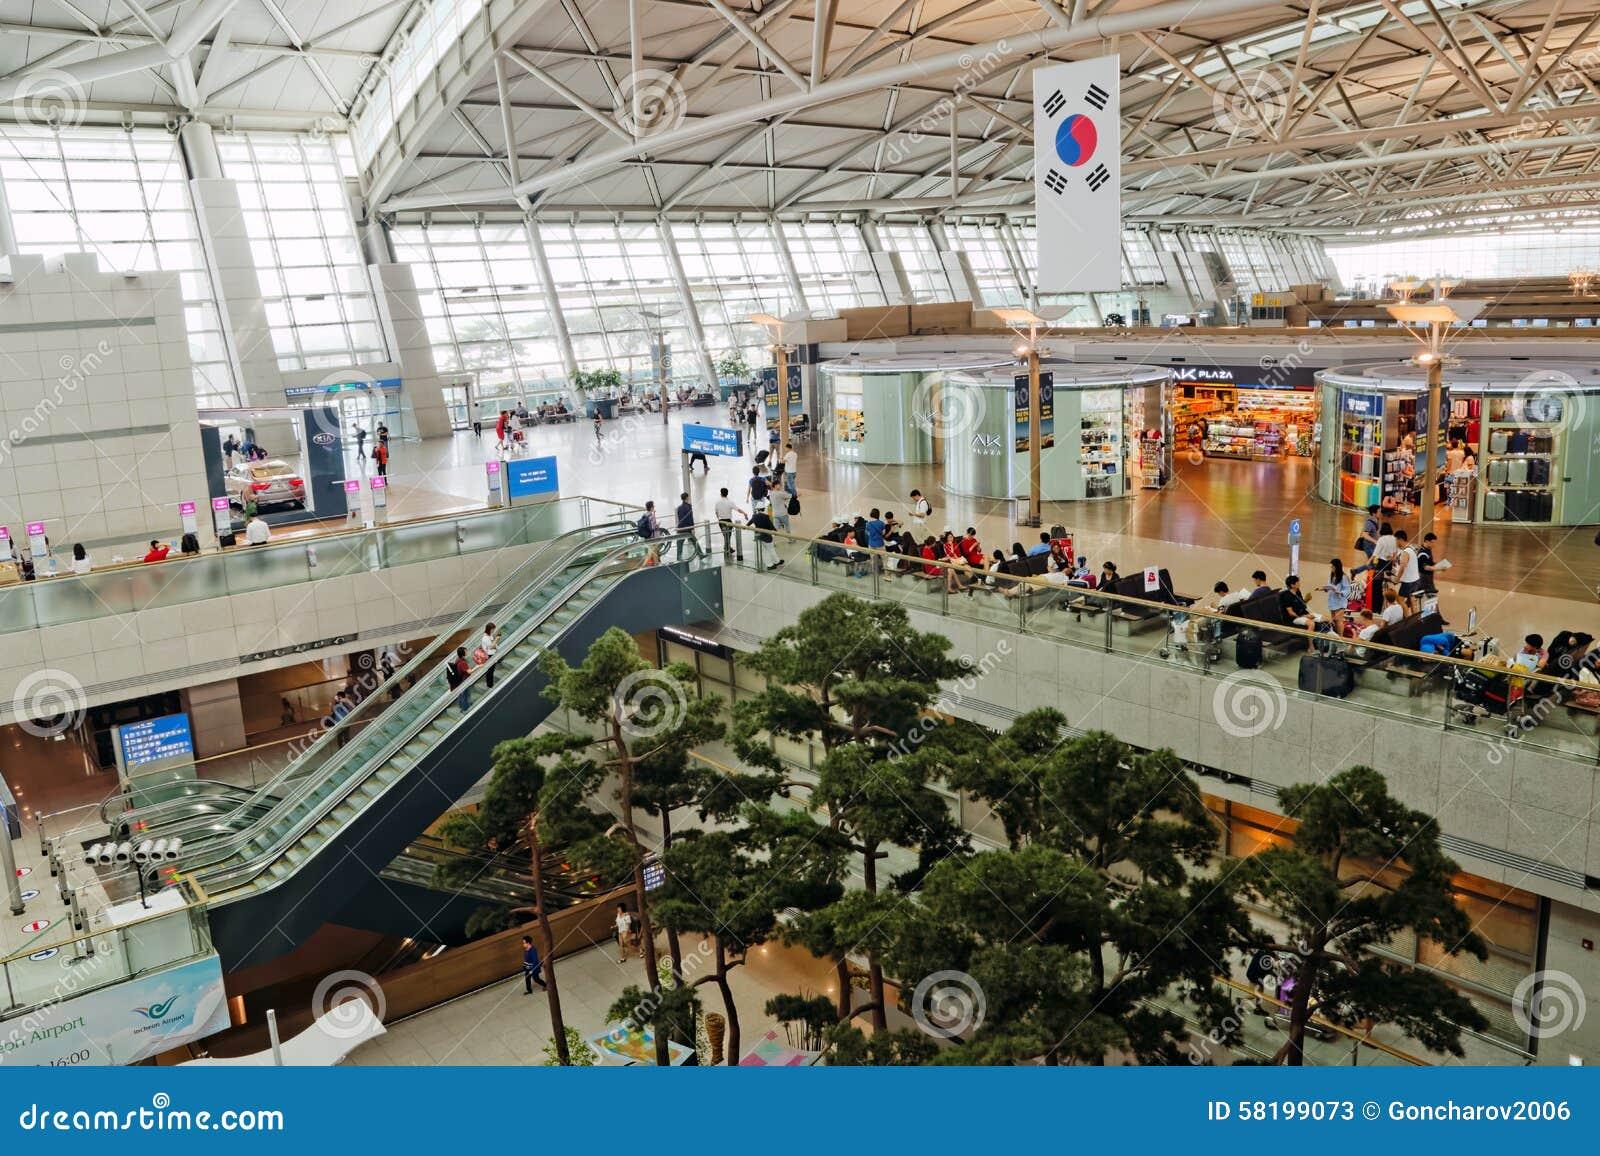 south korea airport 2 - photo #39